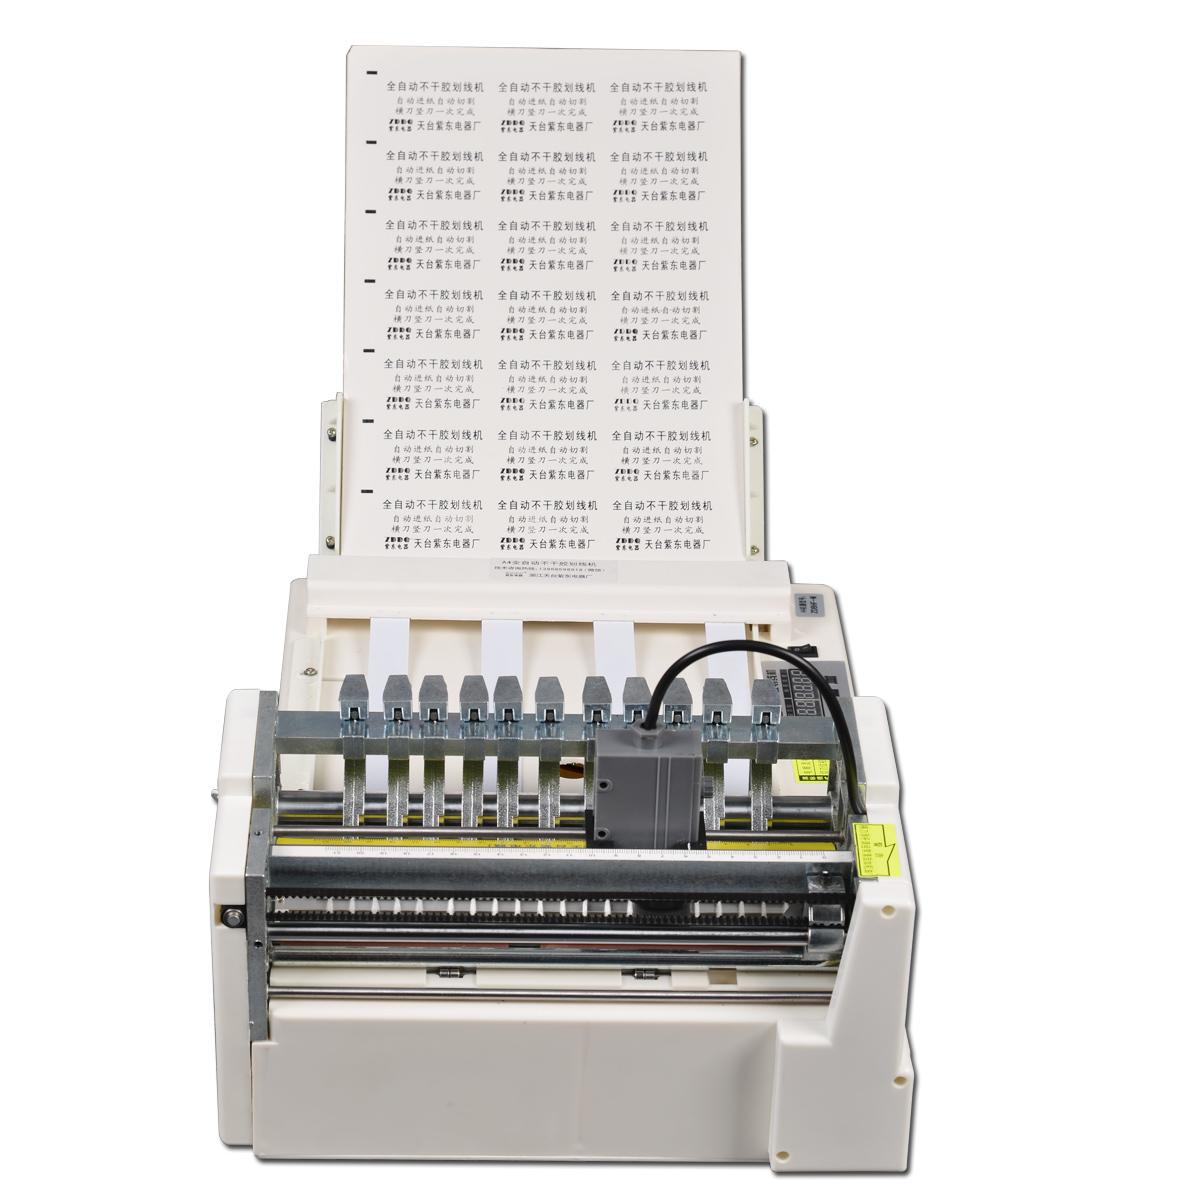 A4全自动不干胶划线机双模快速型标签分切机切割机自动进纸定位不干胶标签纸分离一次横刀竖刀划线机包邮送刀